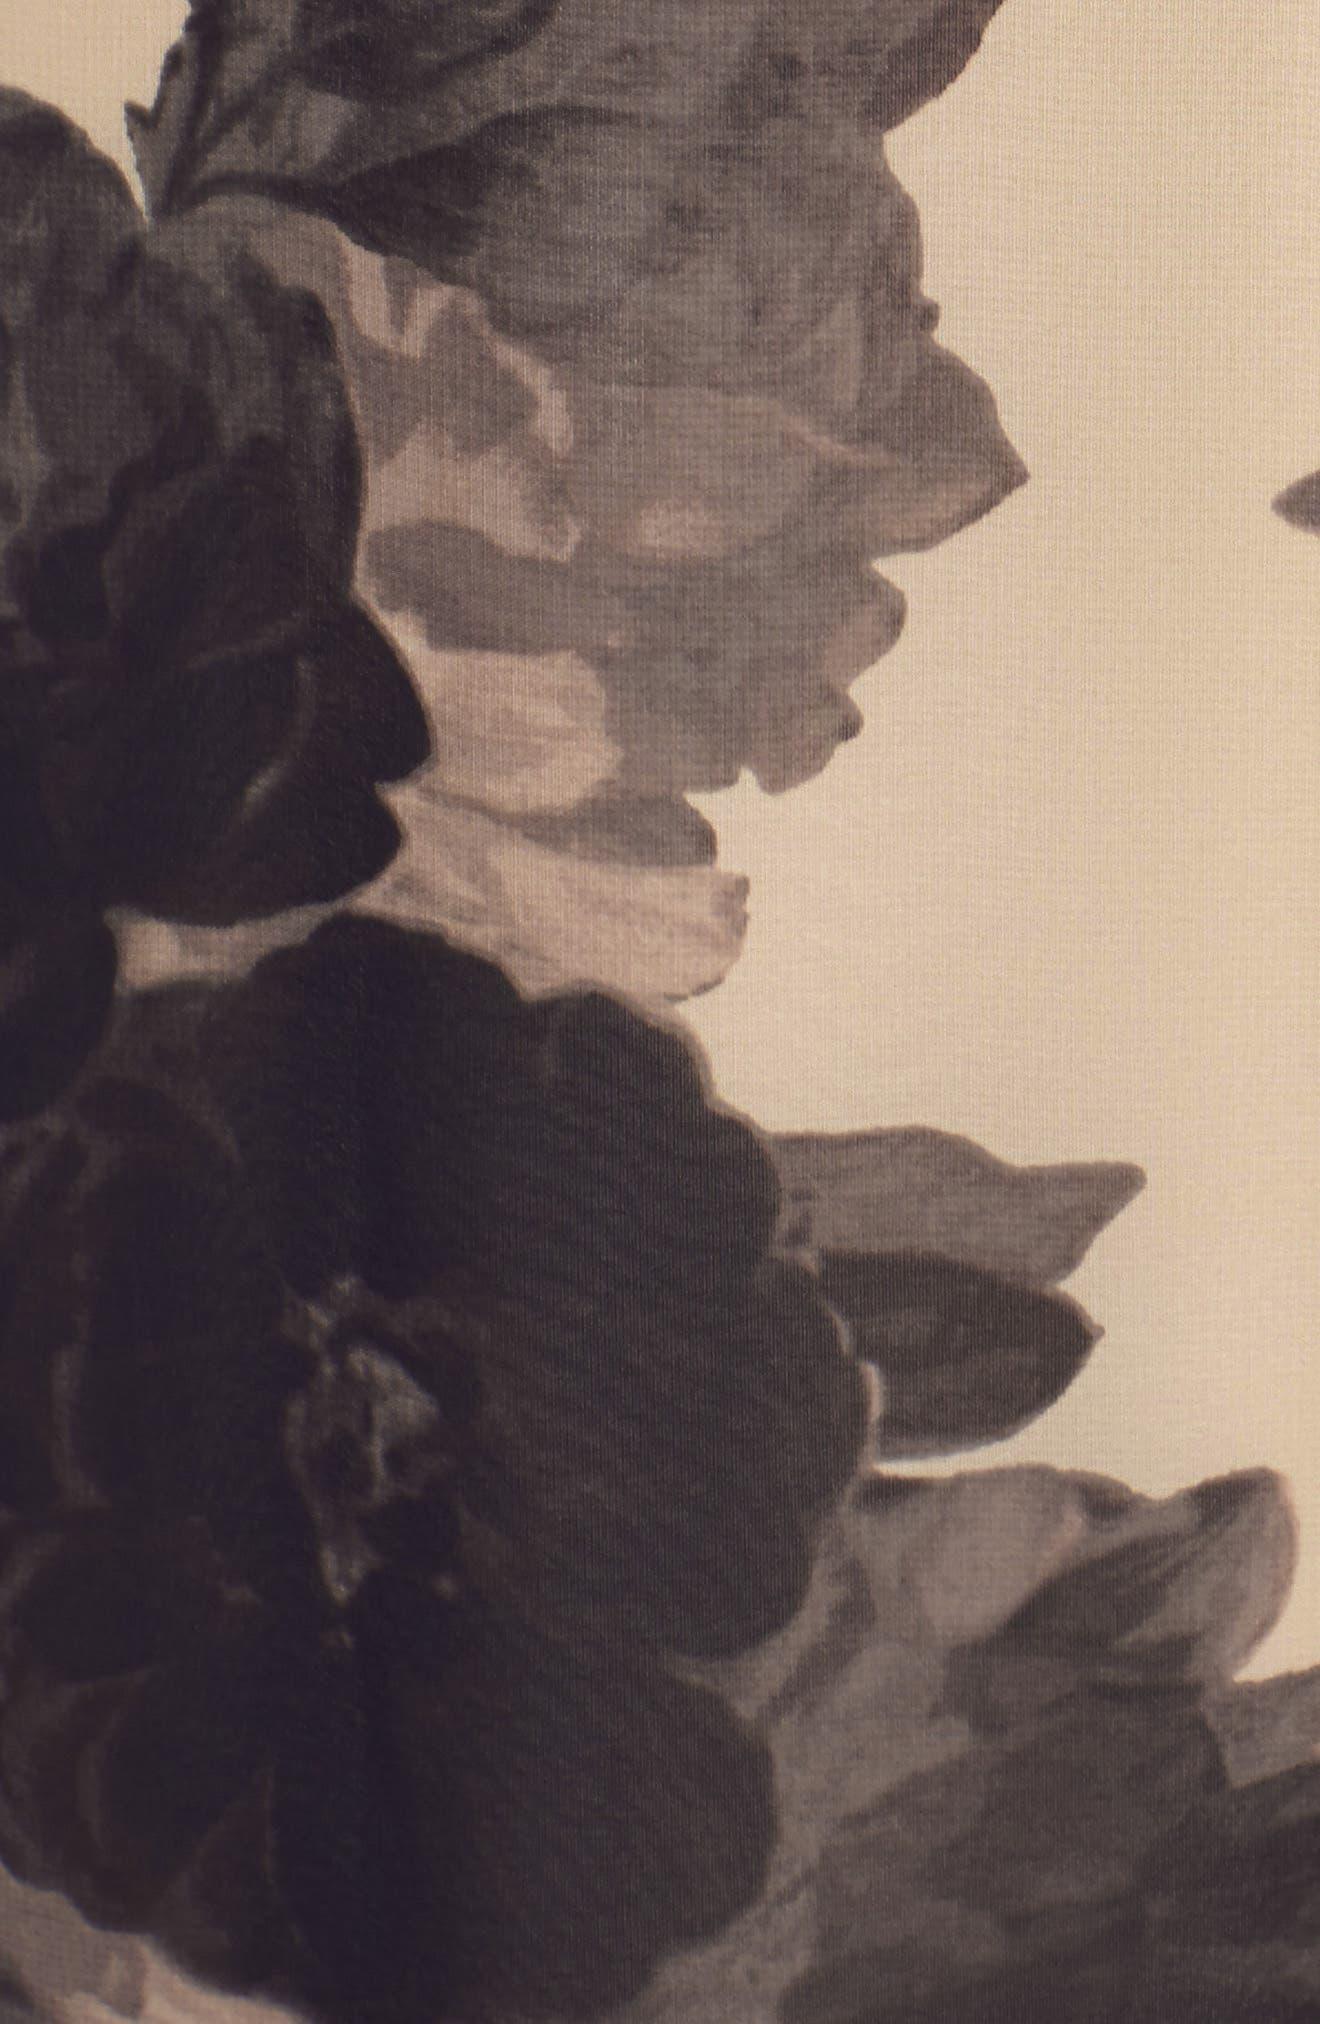 Floral Print Halter Chiffon Maxi Dress,                             Alternate thumbnail 7, color,                             TAUPE/ BLACK